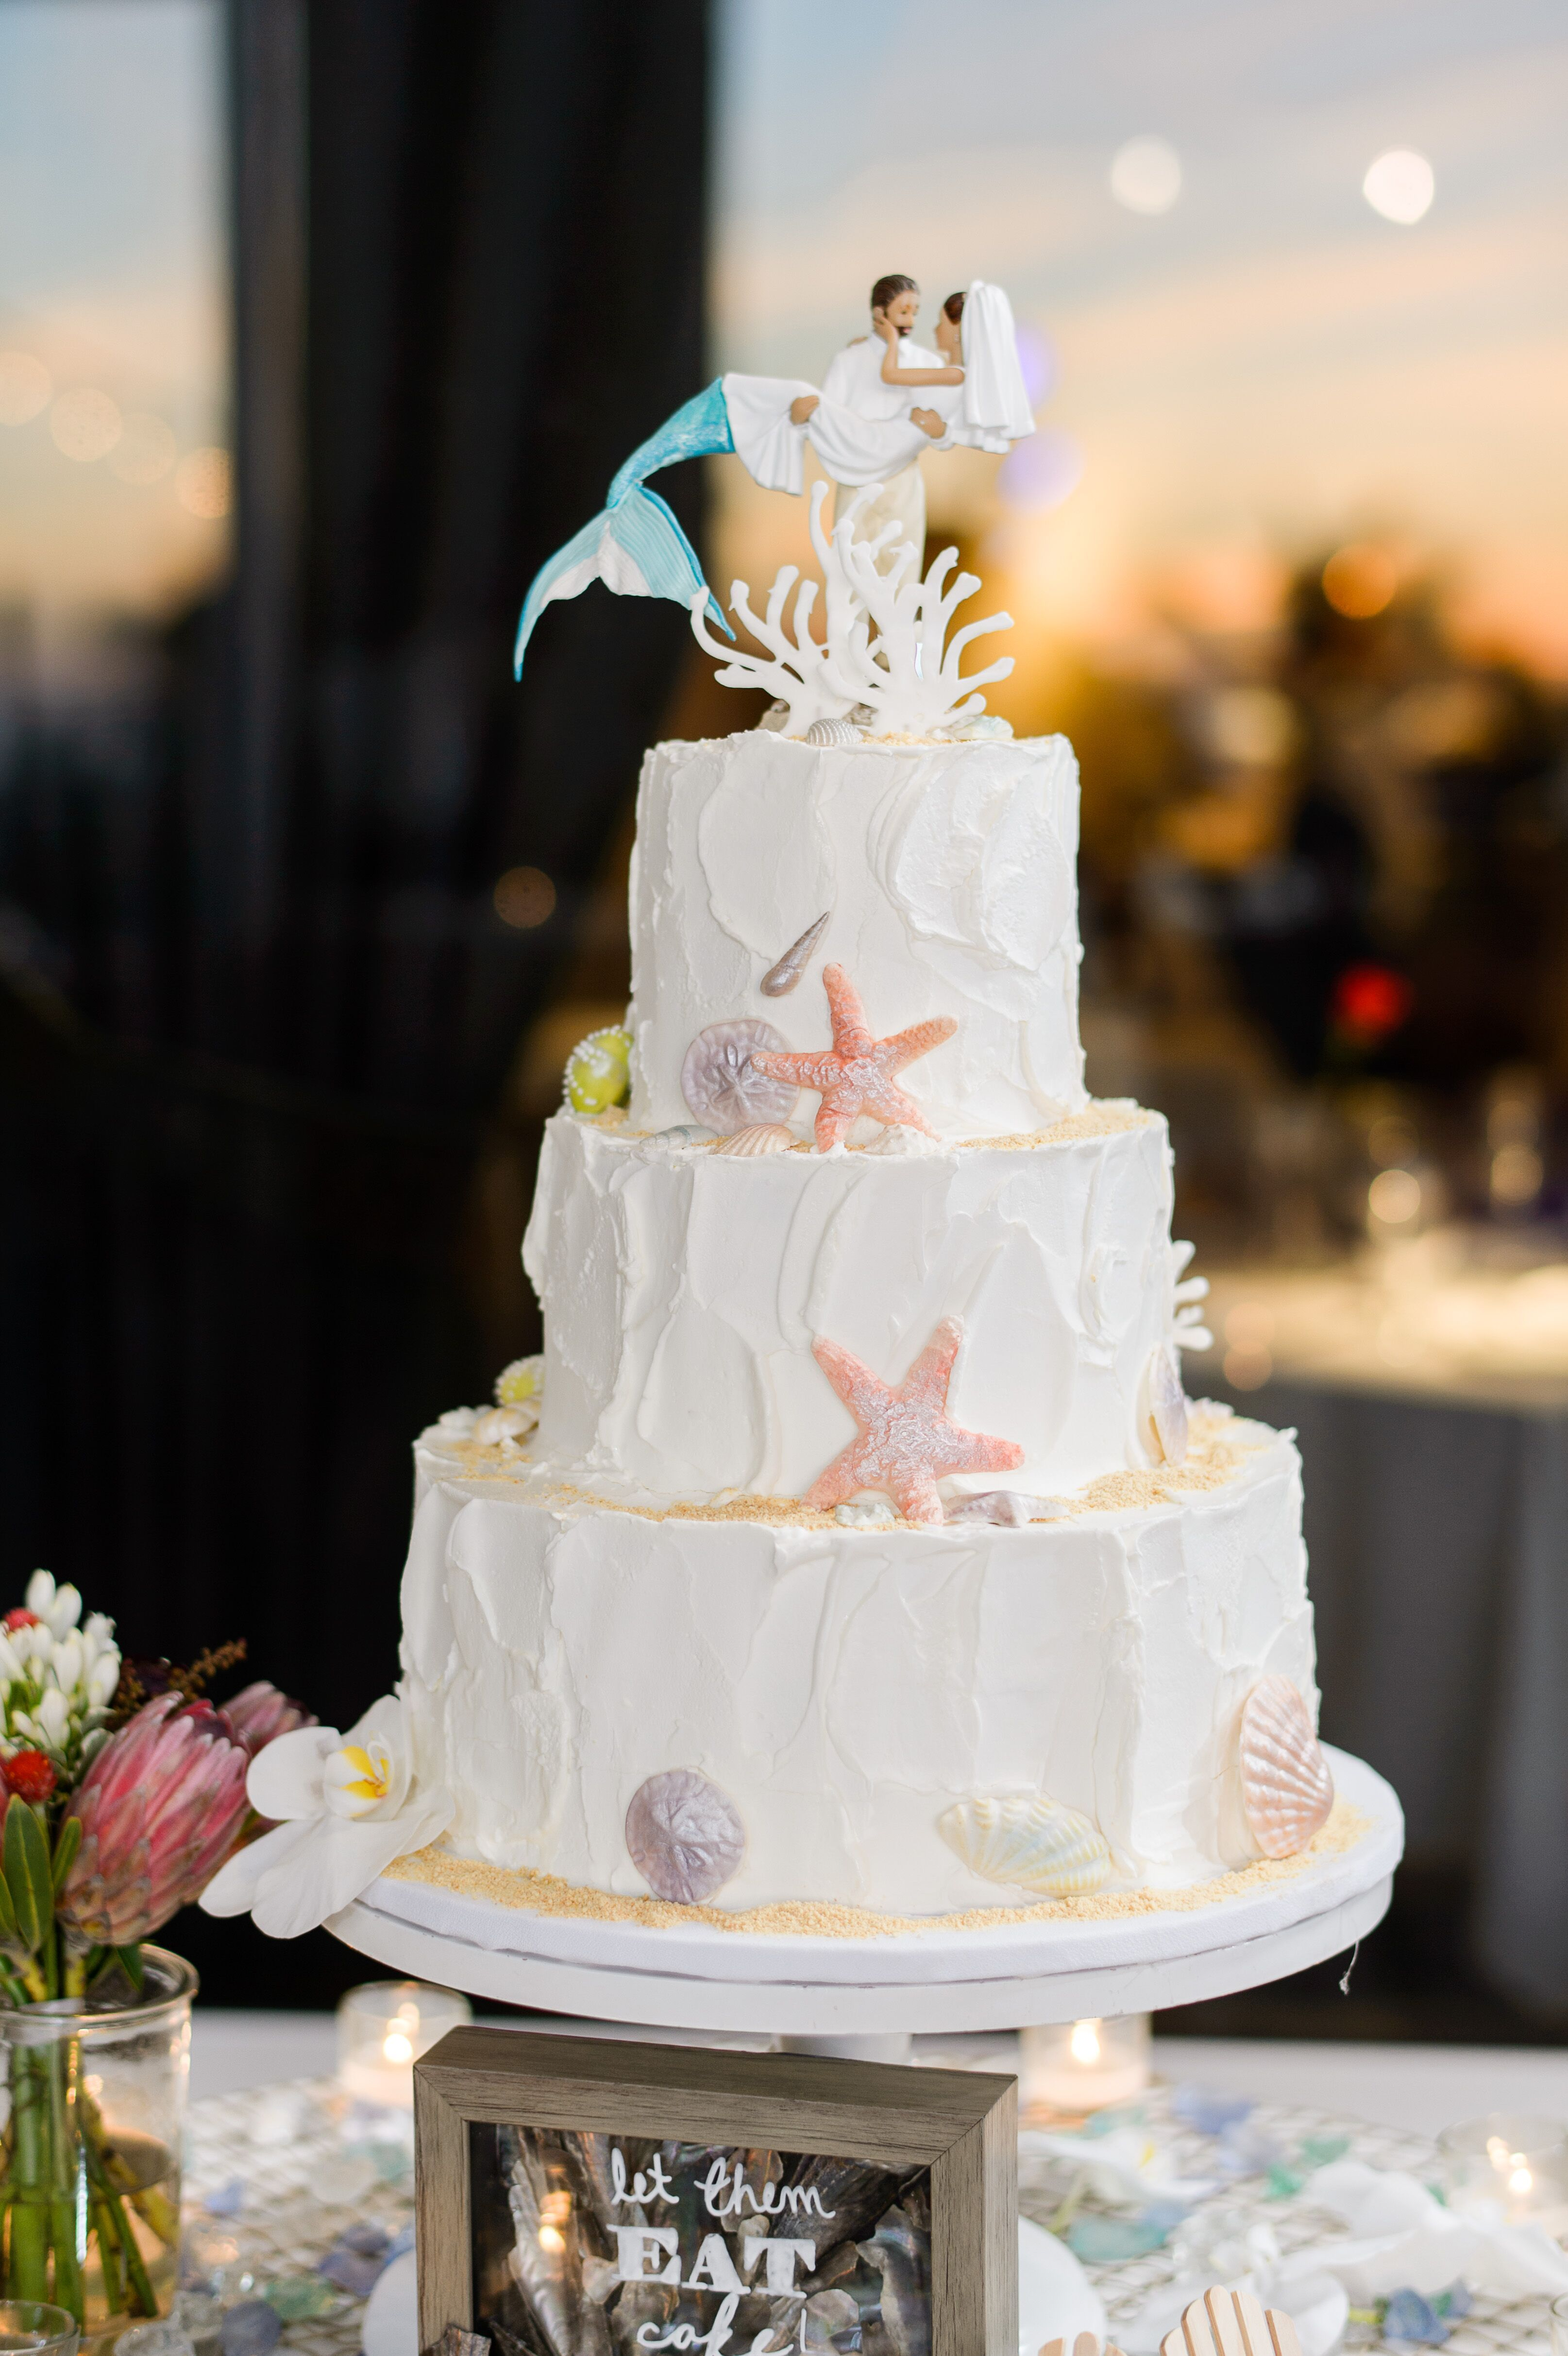 Beach Themed Wedding Cake With Mermaid Cake Topper In 2020 Beach Wedding Cake Toppers Beach Theme Wedding Cakes Beach Wedding Cake